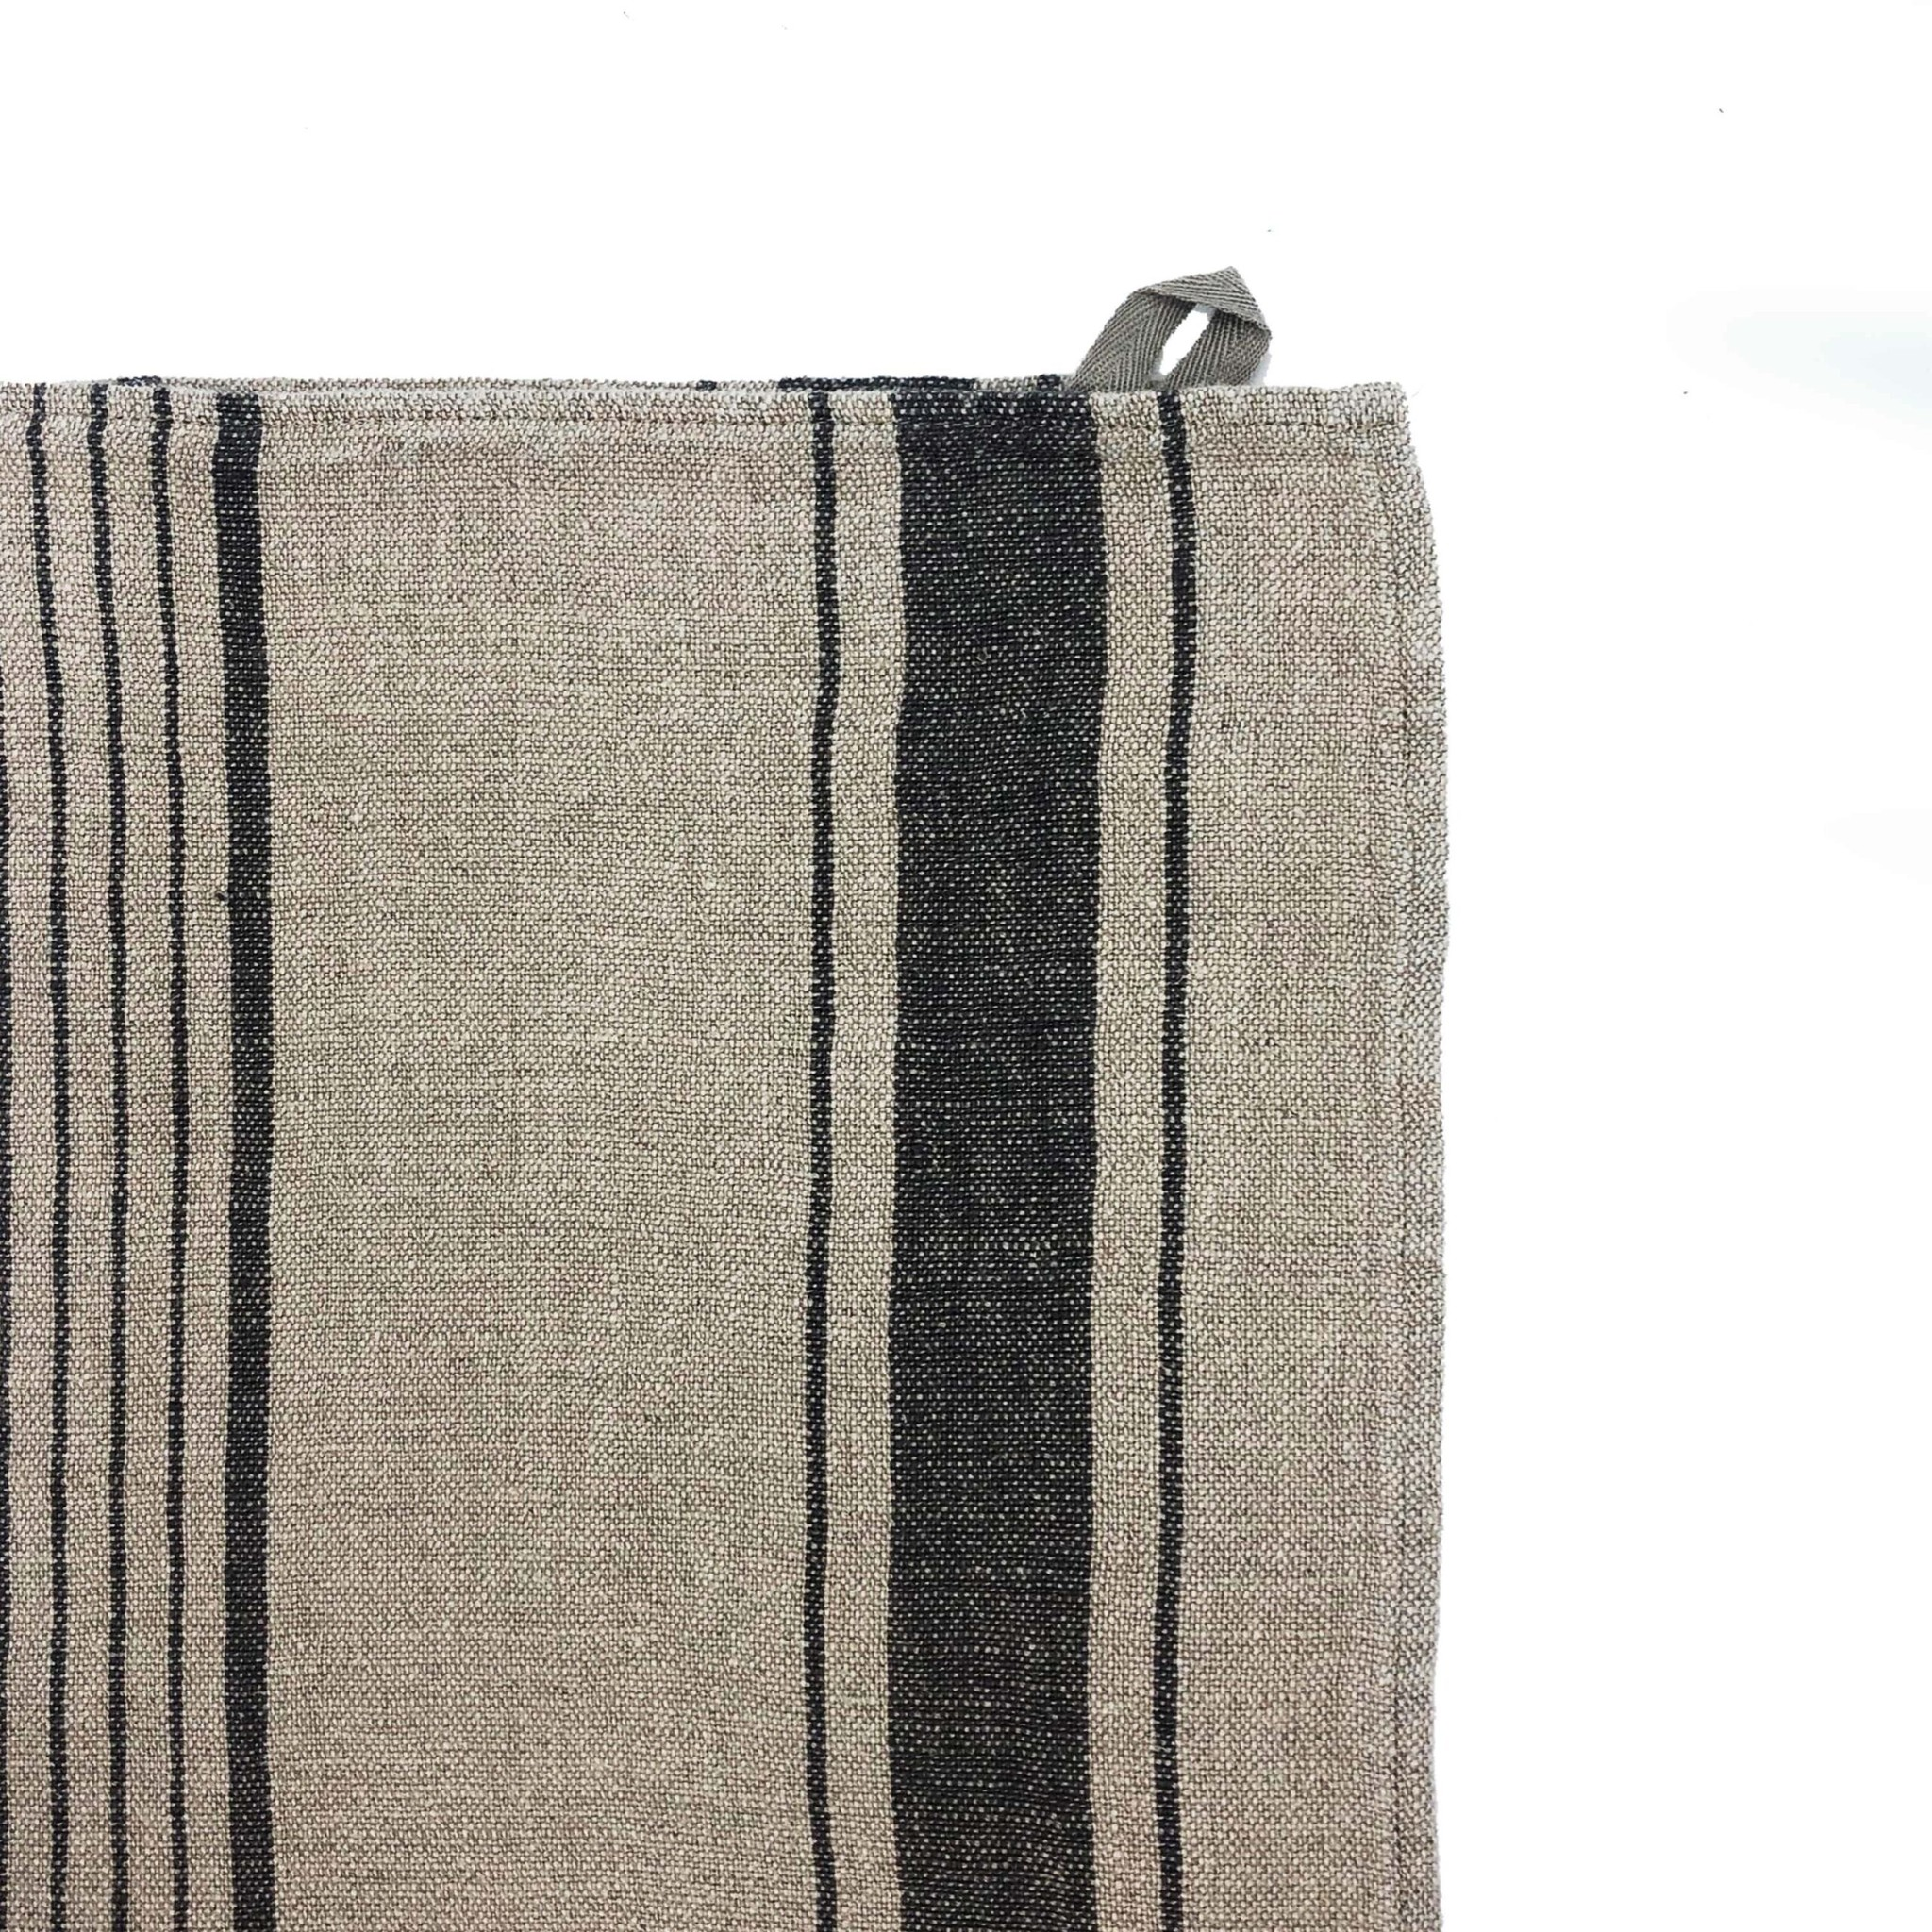 Tea-Towel - Augagne - Nat/Grey-2